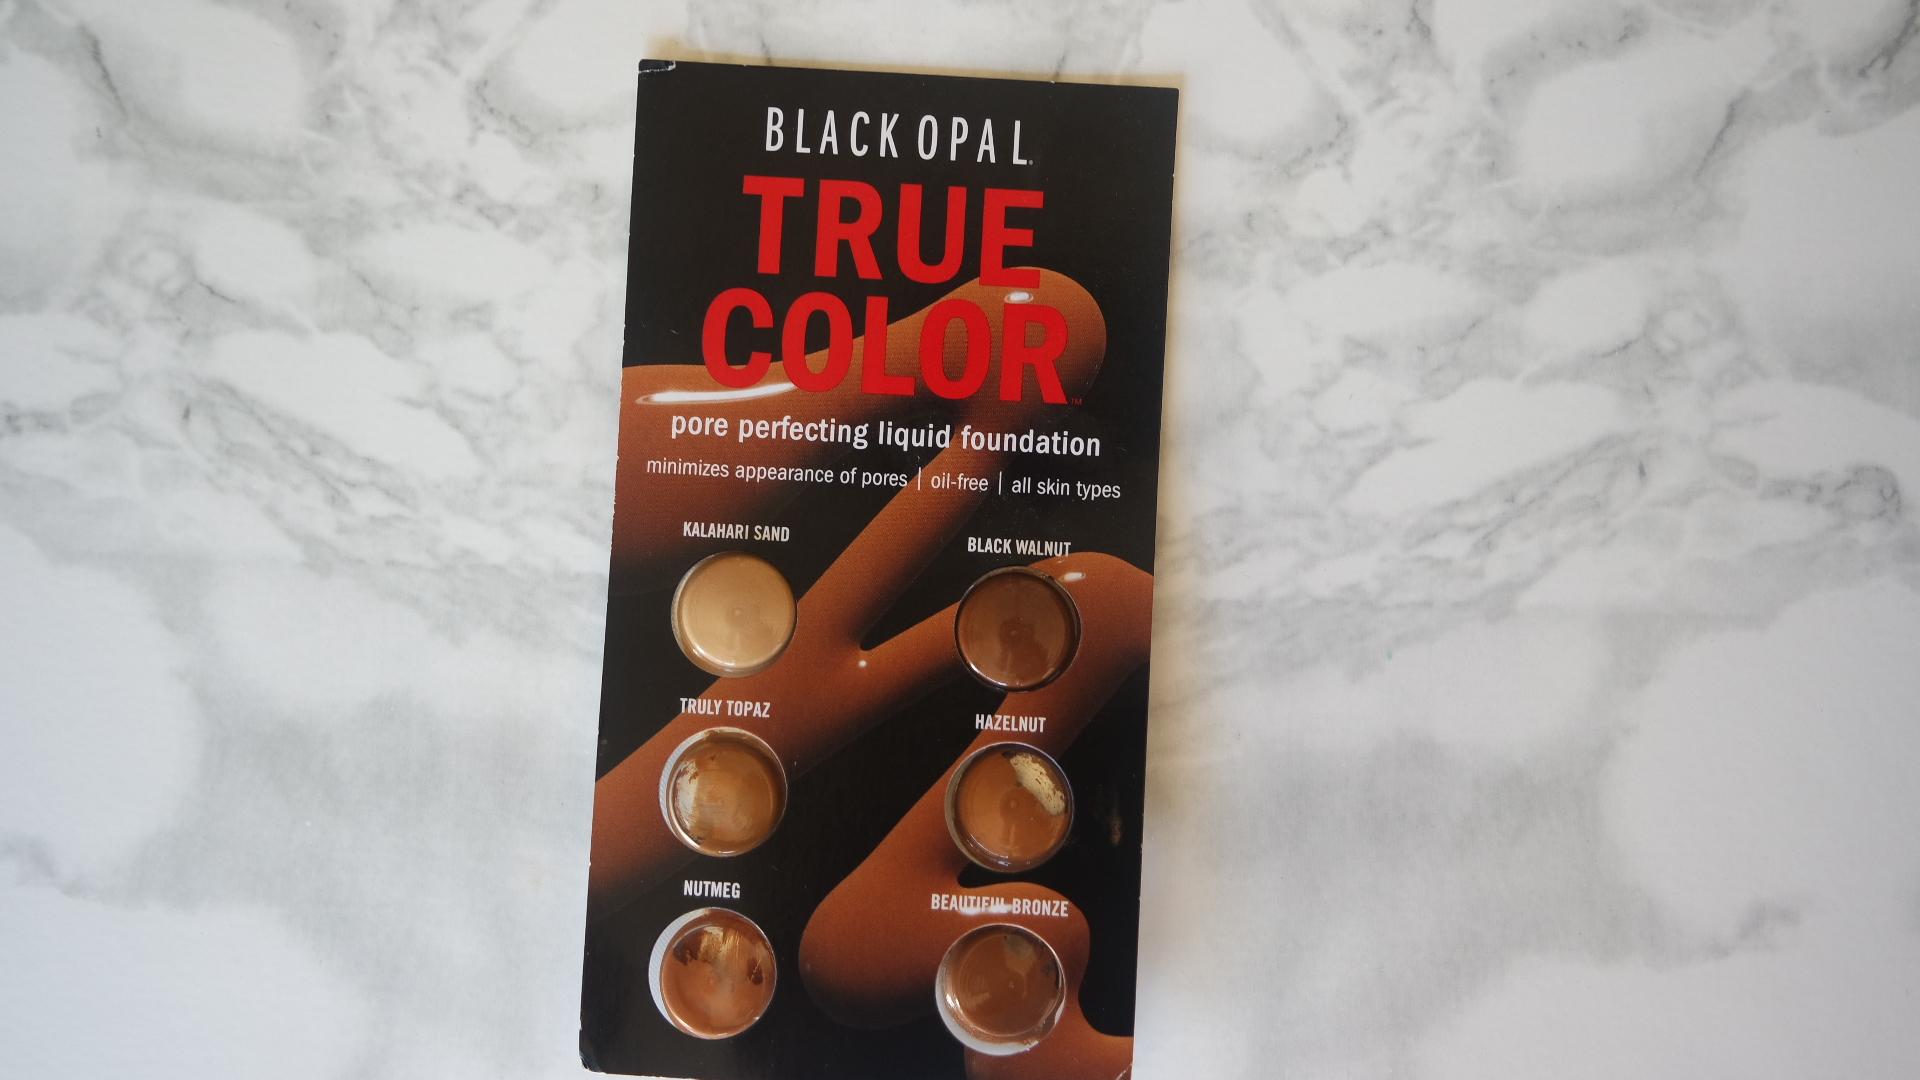 Black Opal True Color Pore Perfecting Liquid Foundation Swatches